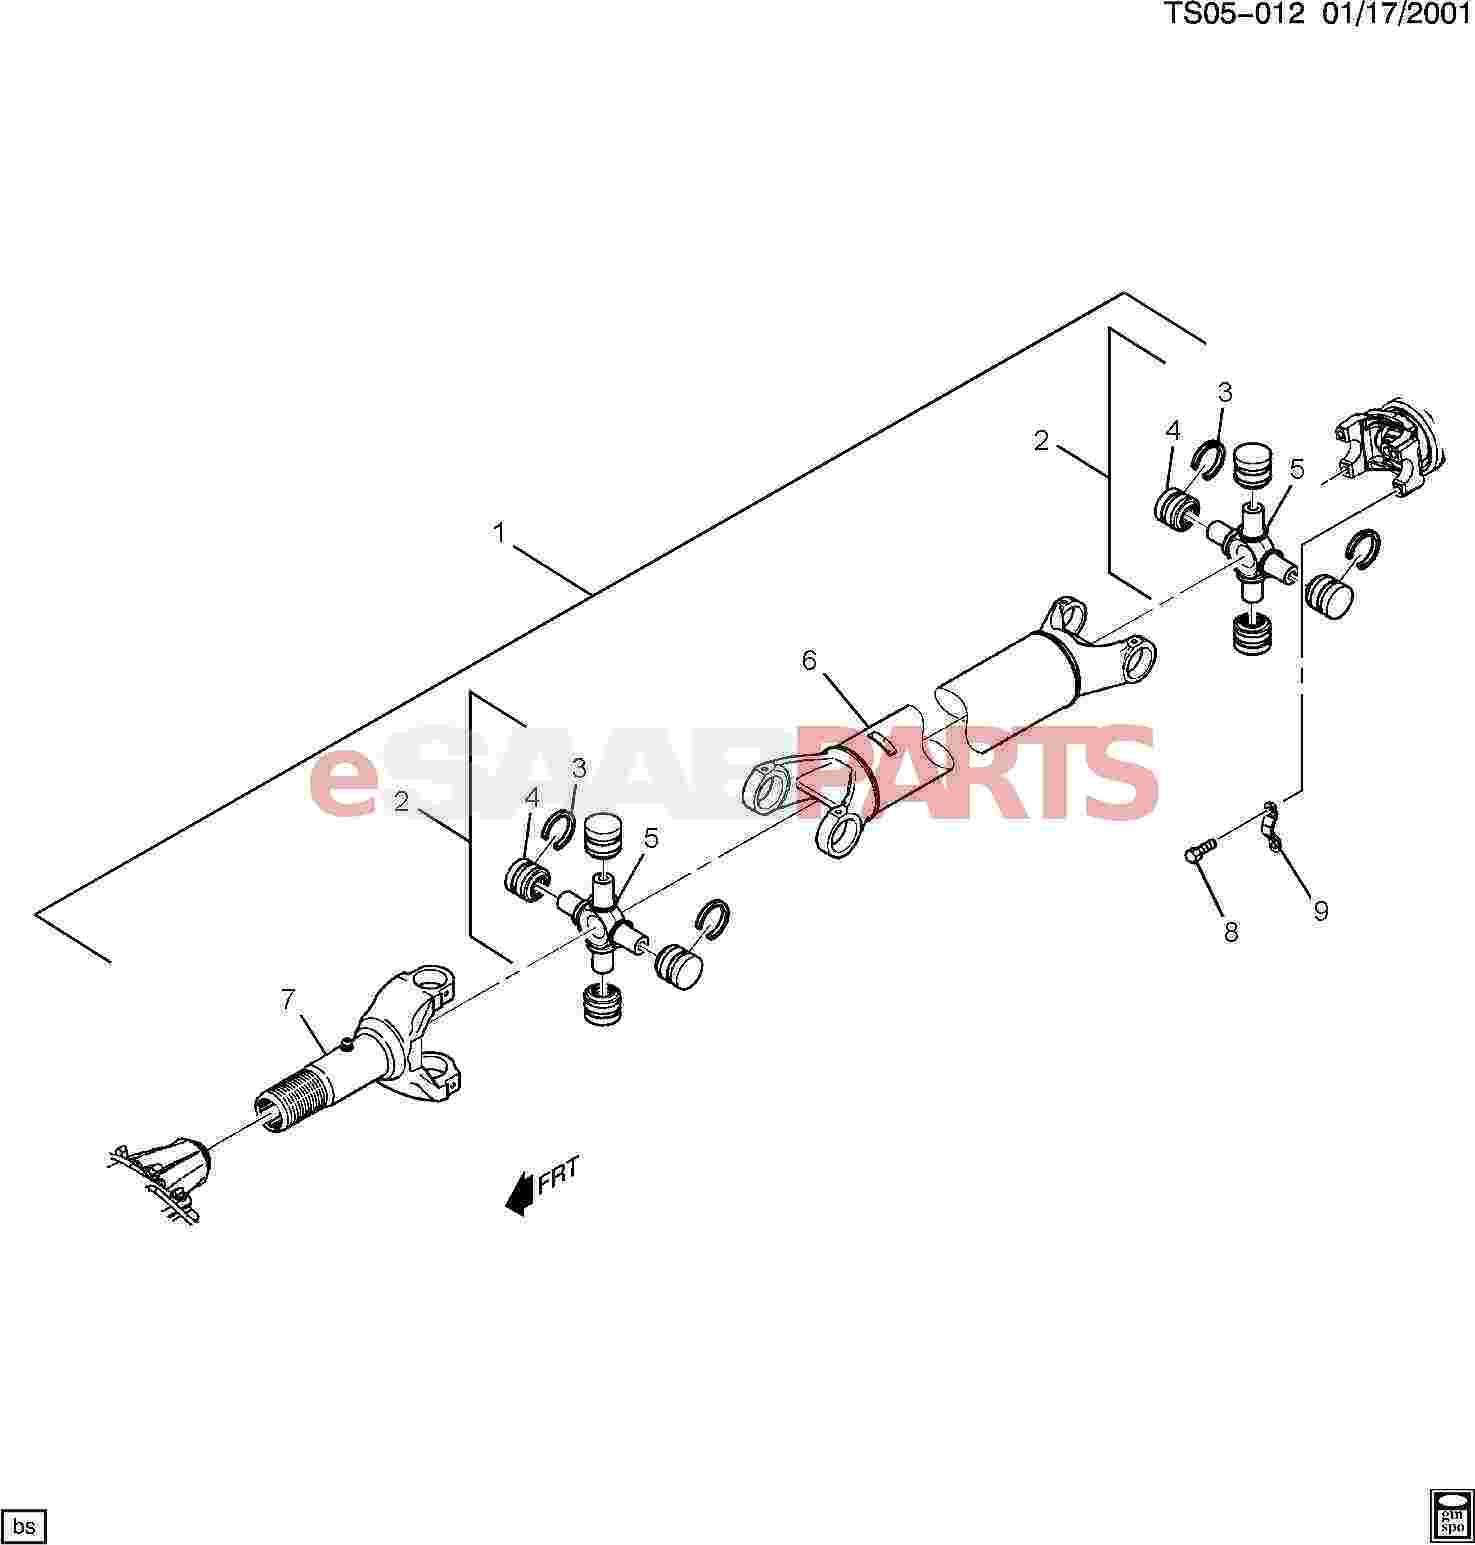 Saab Joint Kit Prop Shf Rear Universal